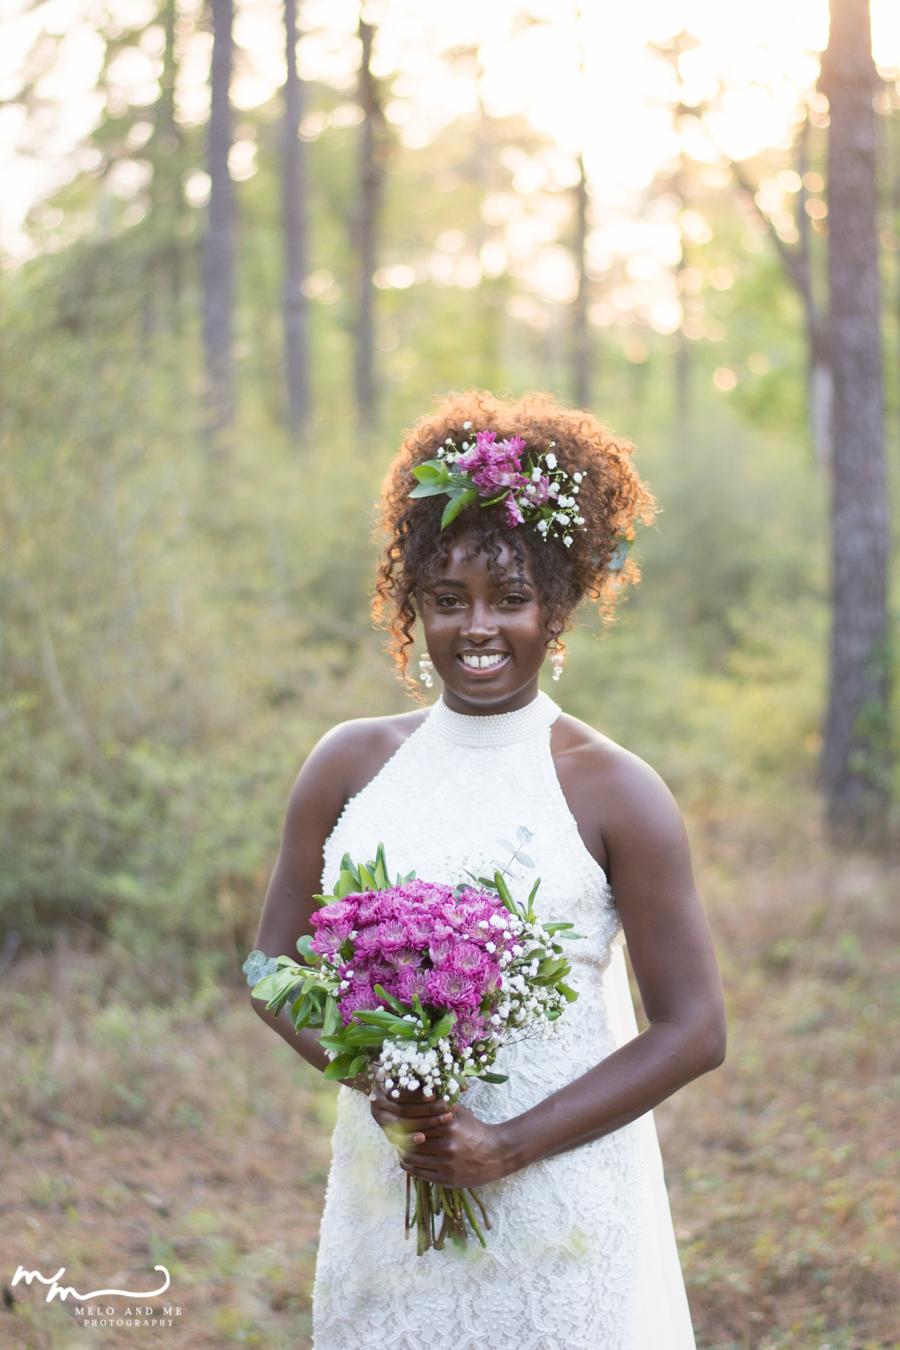 the woodlands tx photographer conroe tx bridal wedding photography jasper tx southeast texas photographer-8.jpg